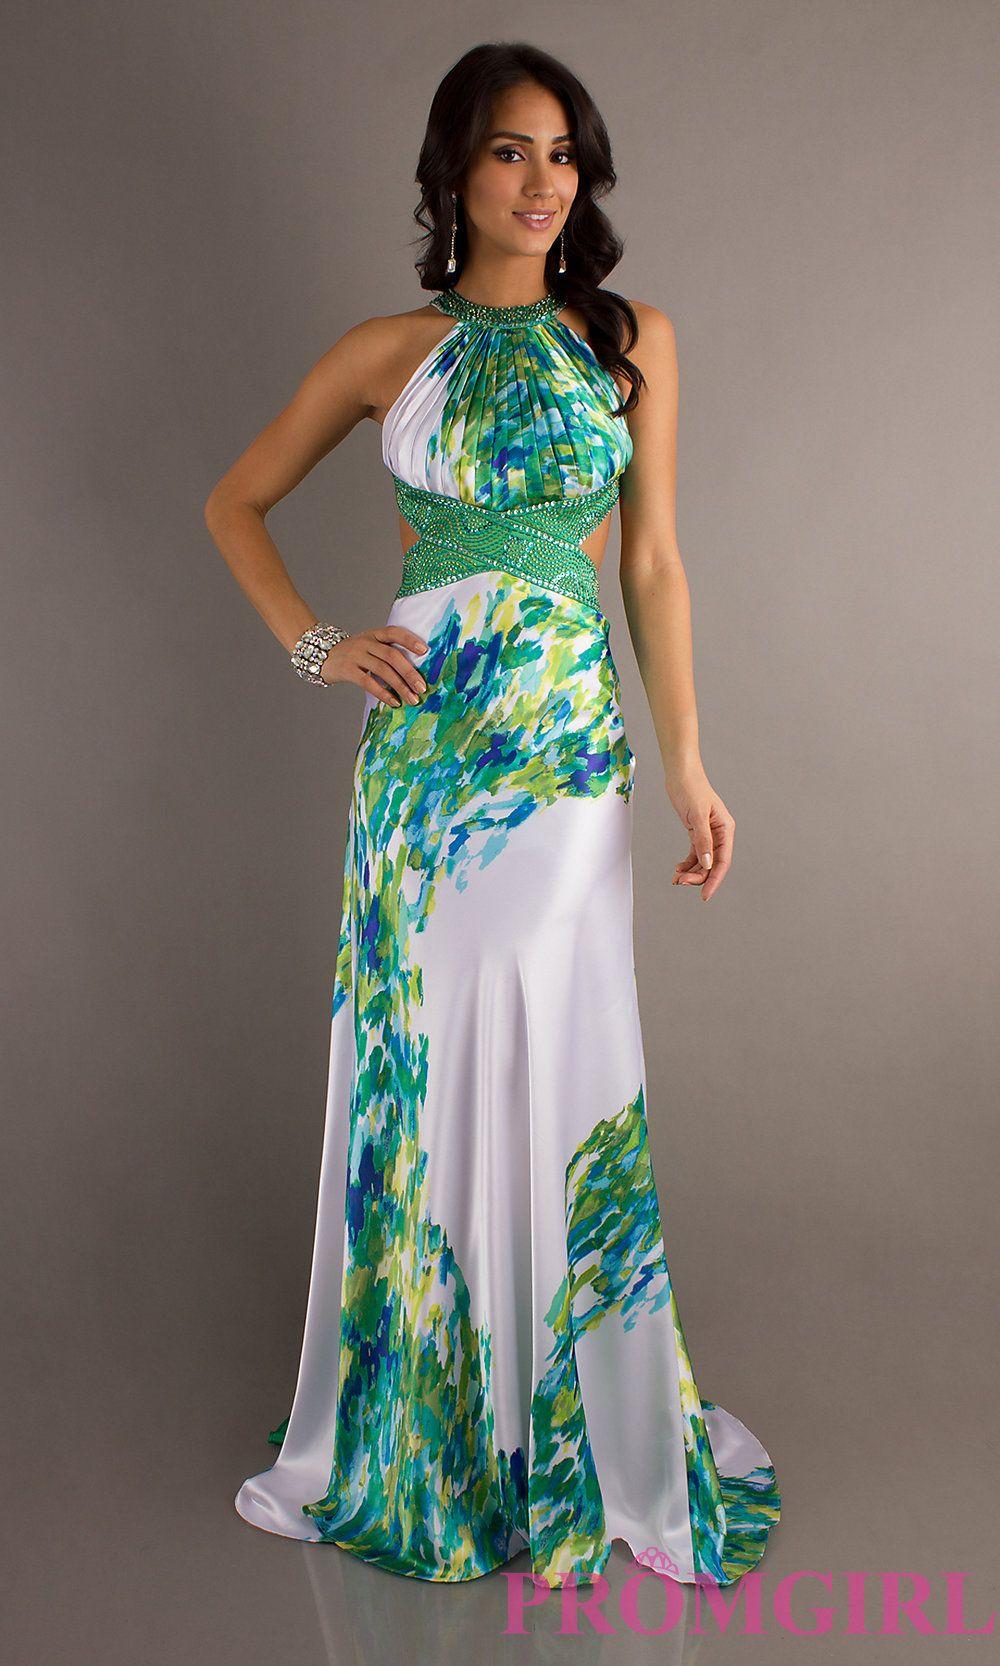 Printed Gown Dresses Halter Prom Dresses Long Print Prom Dresses